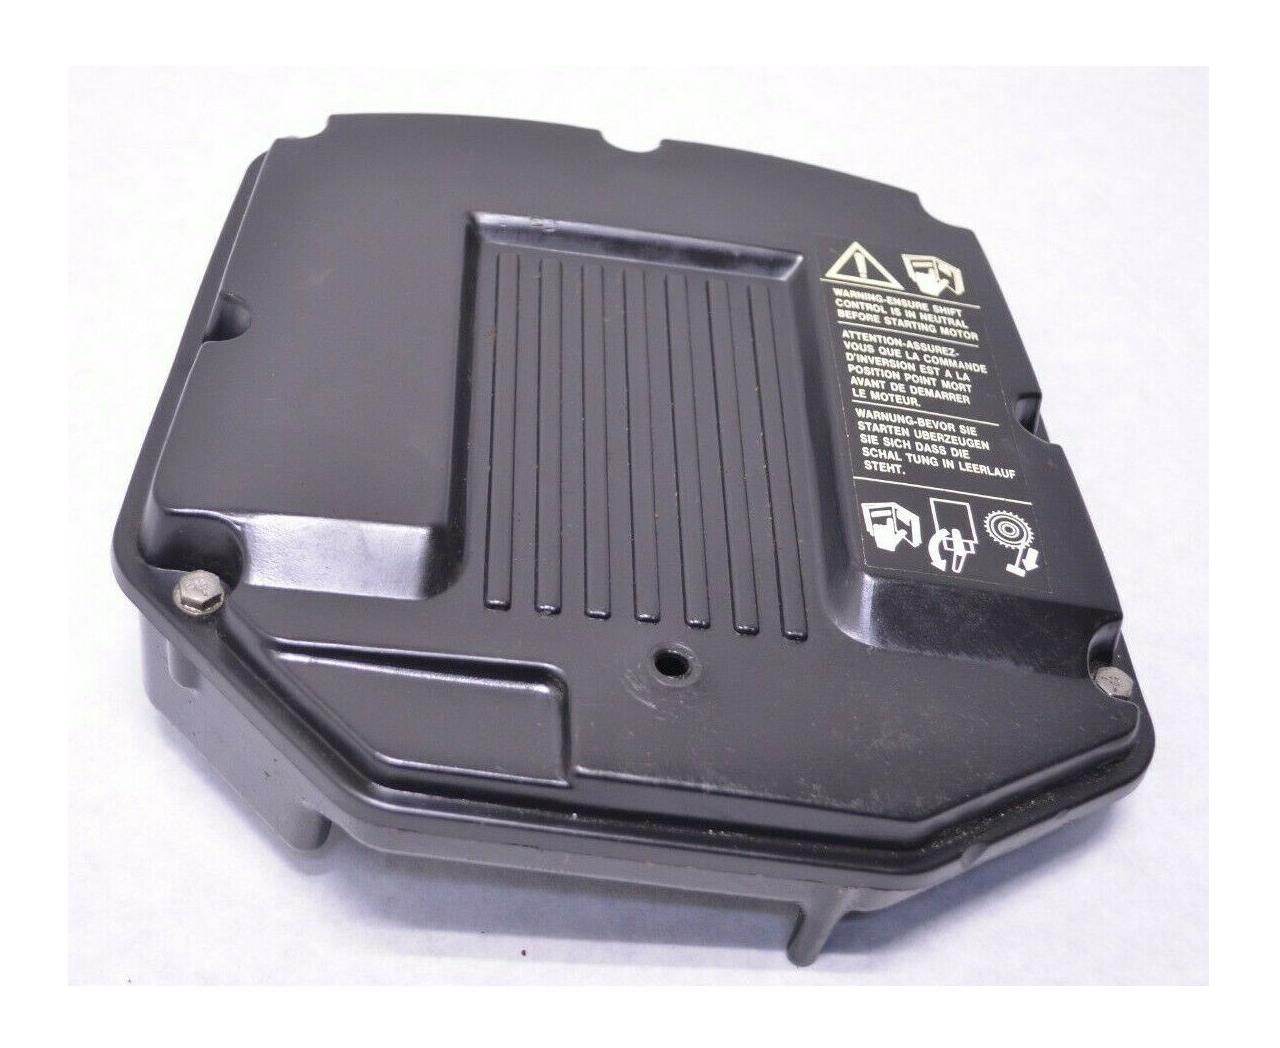 OMC/Johnson evinrude 40/50 PK Base Air Silencer elektrische start (0333522, 0336856)